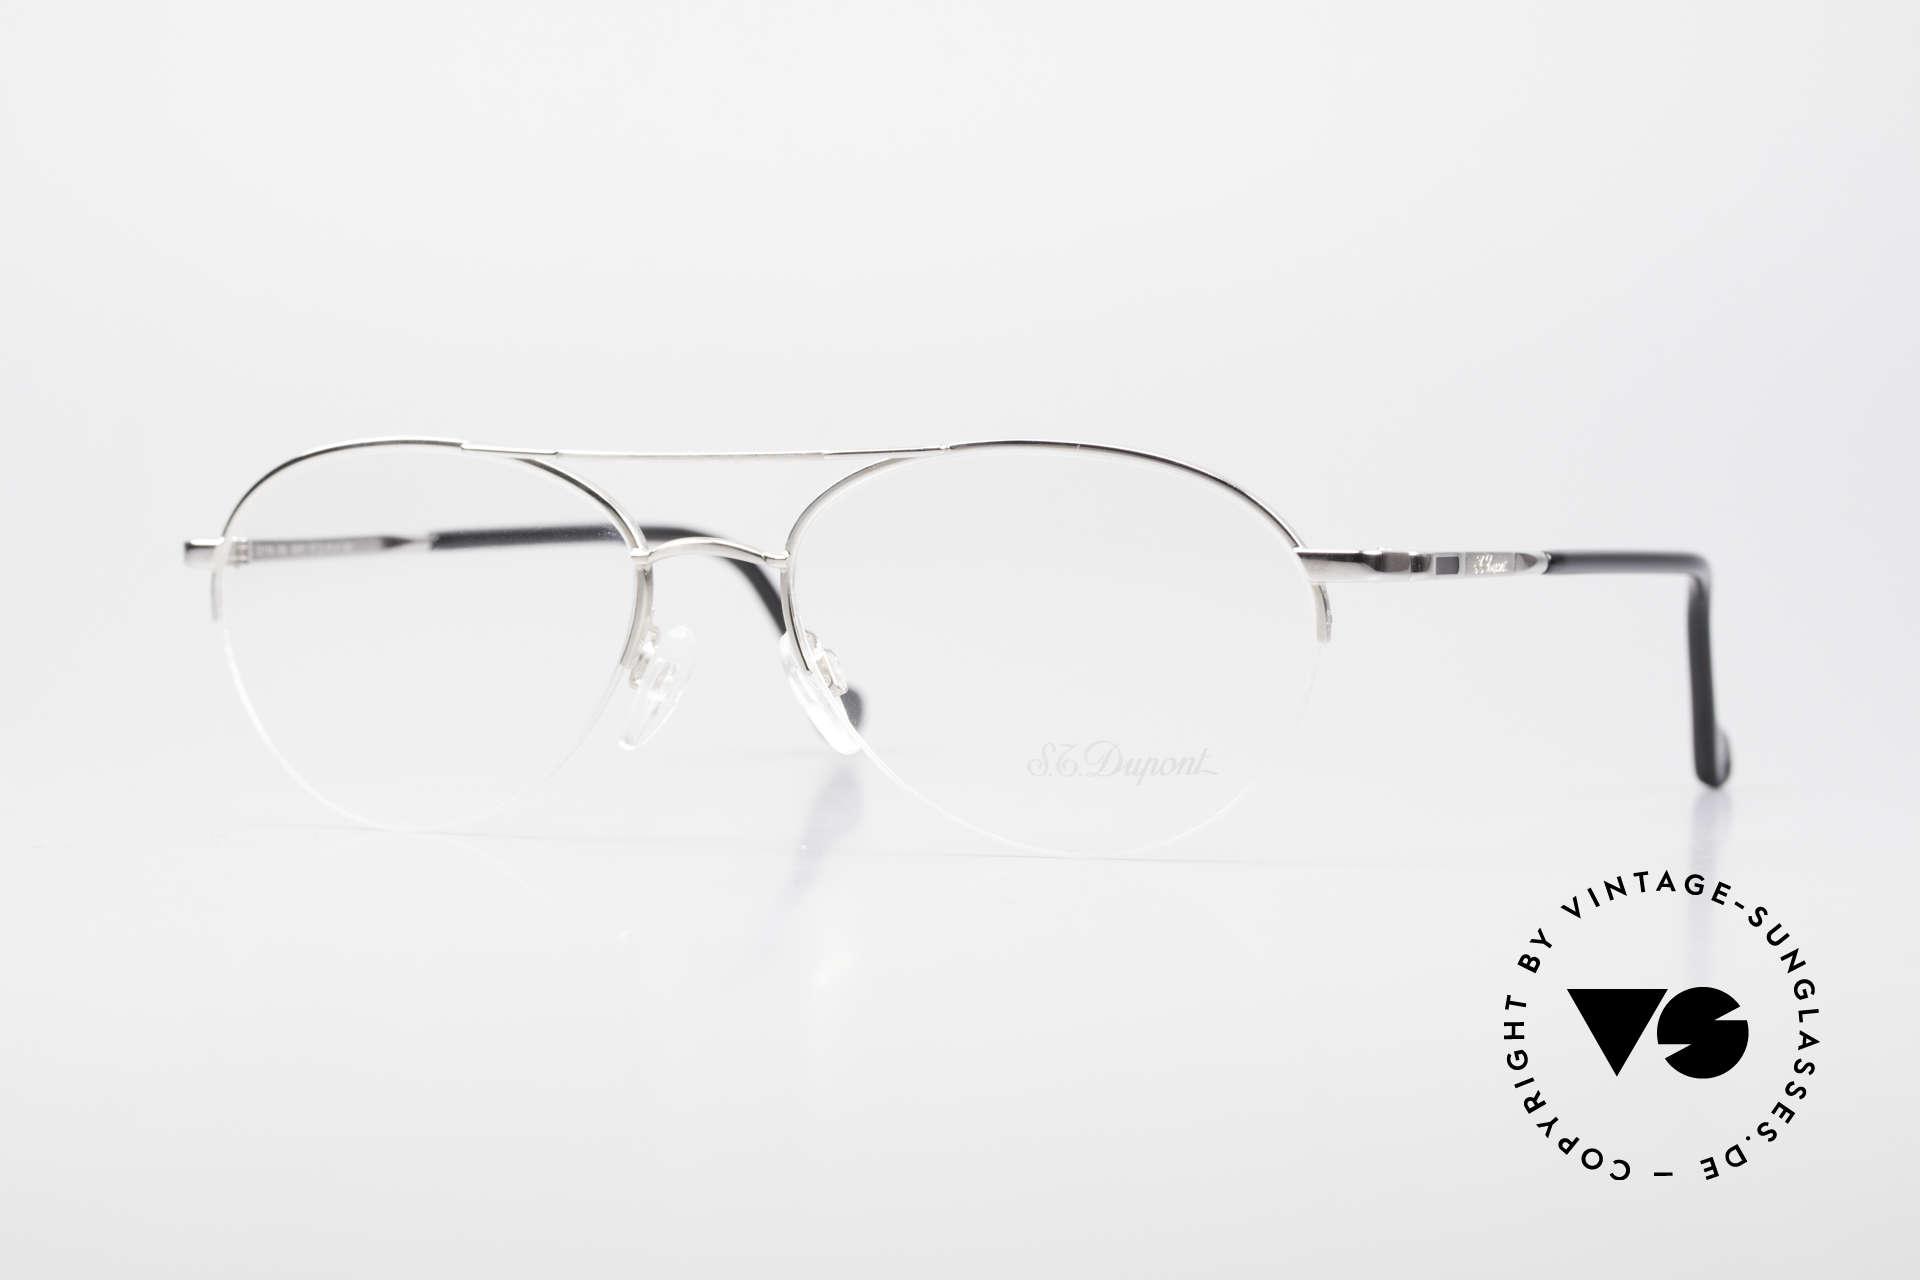 S.T. Dupont D116 Nylor Aviator Glasses 2000's, old S.T. DUPONT luxury glasses, model D116 from 2002, Made for Men